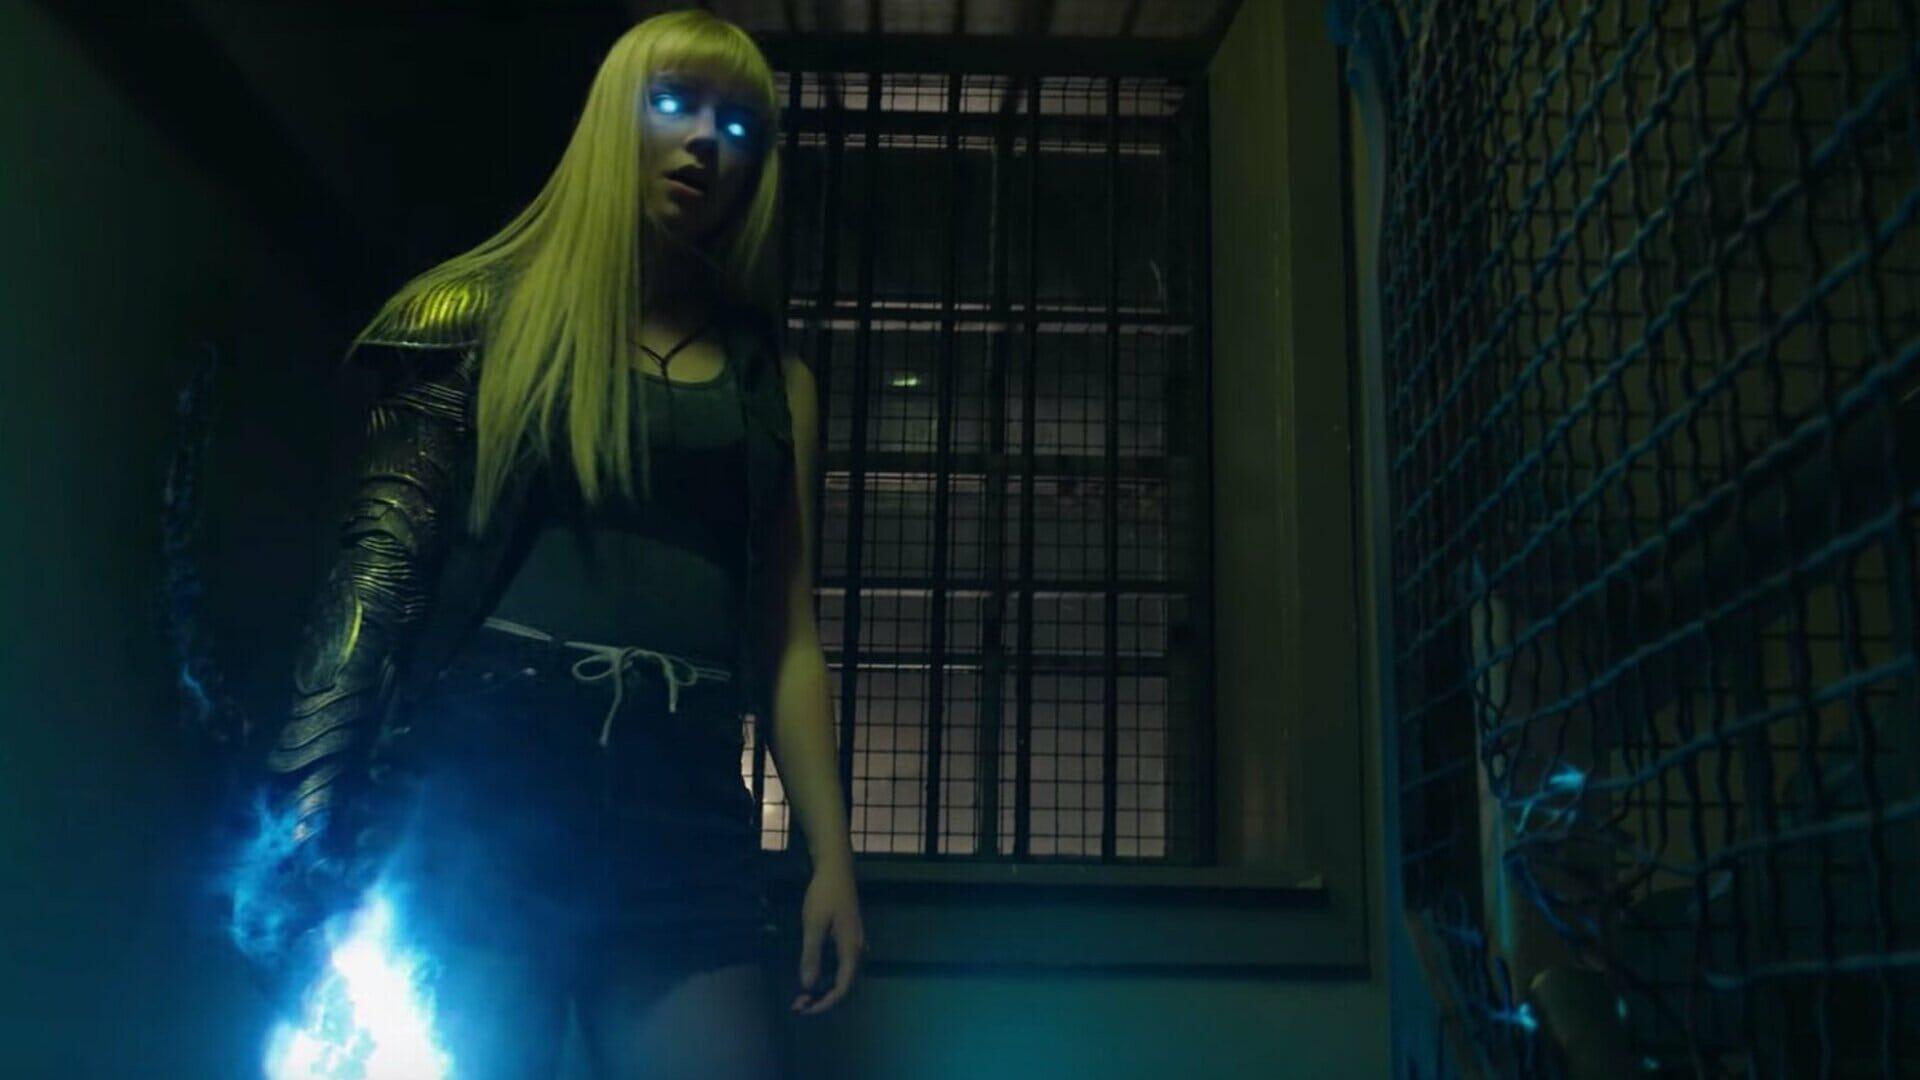 Les-Nouveaux-Mutants-Anya-Taylor-joy